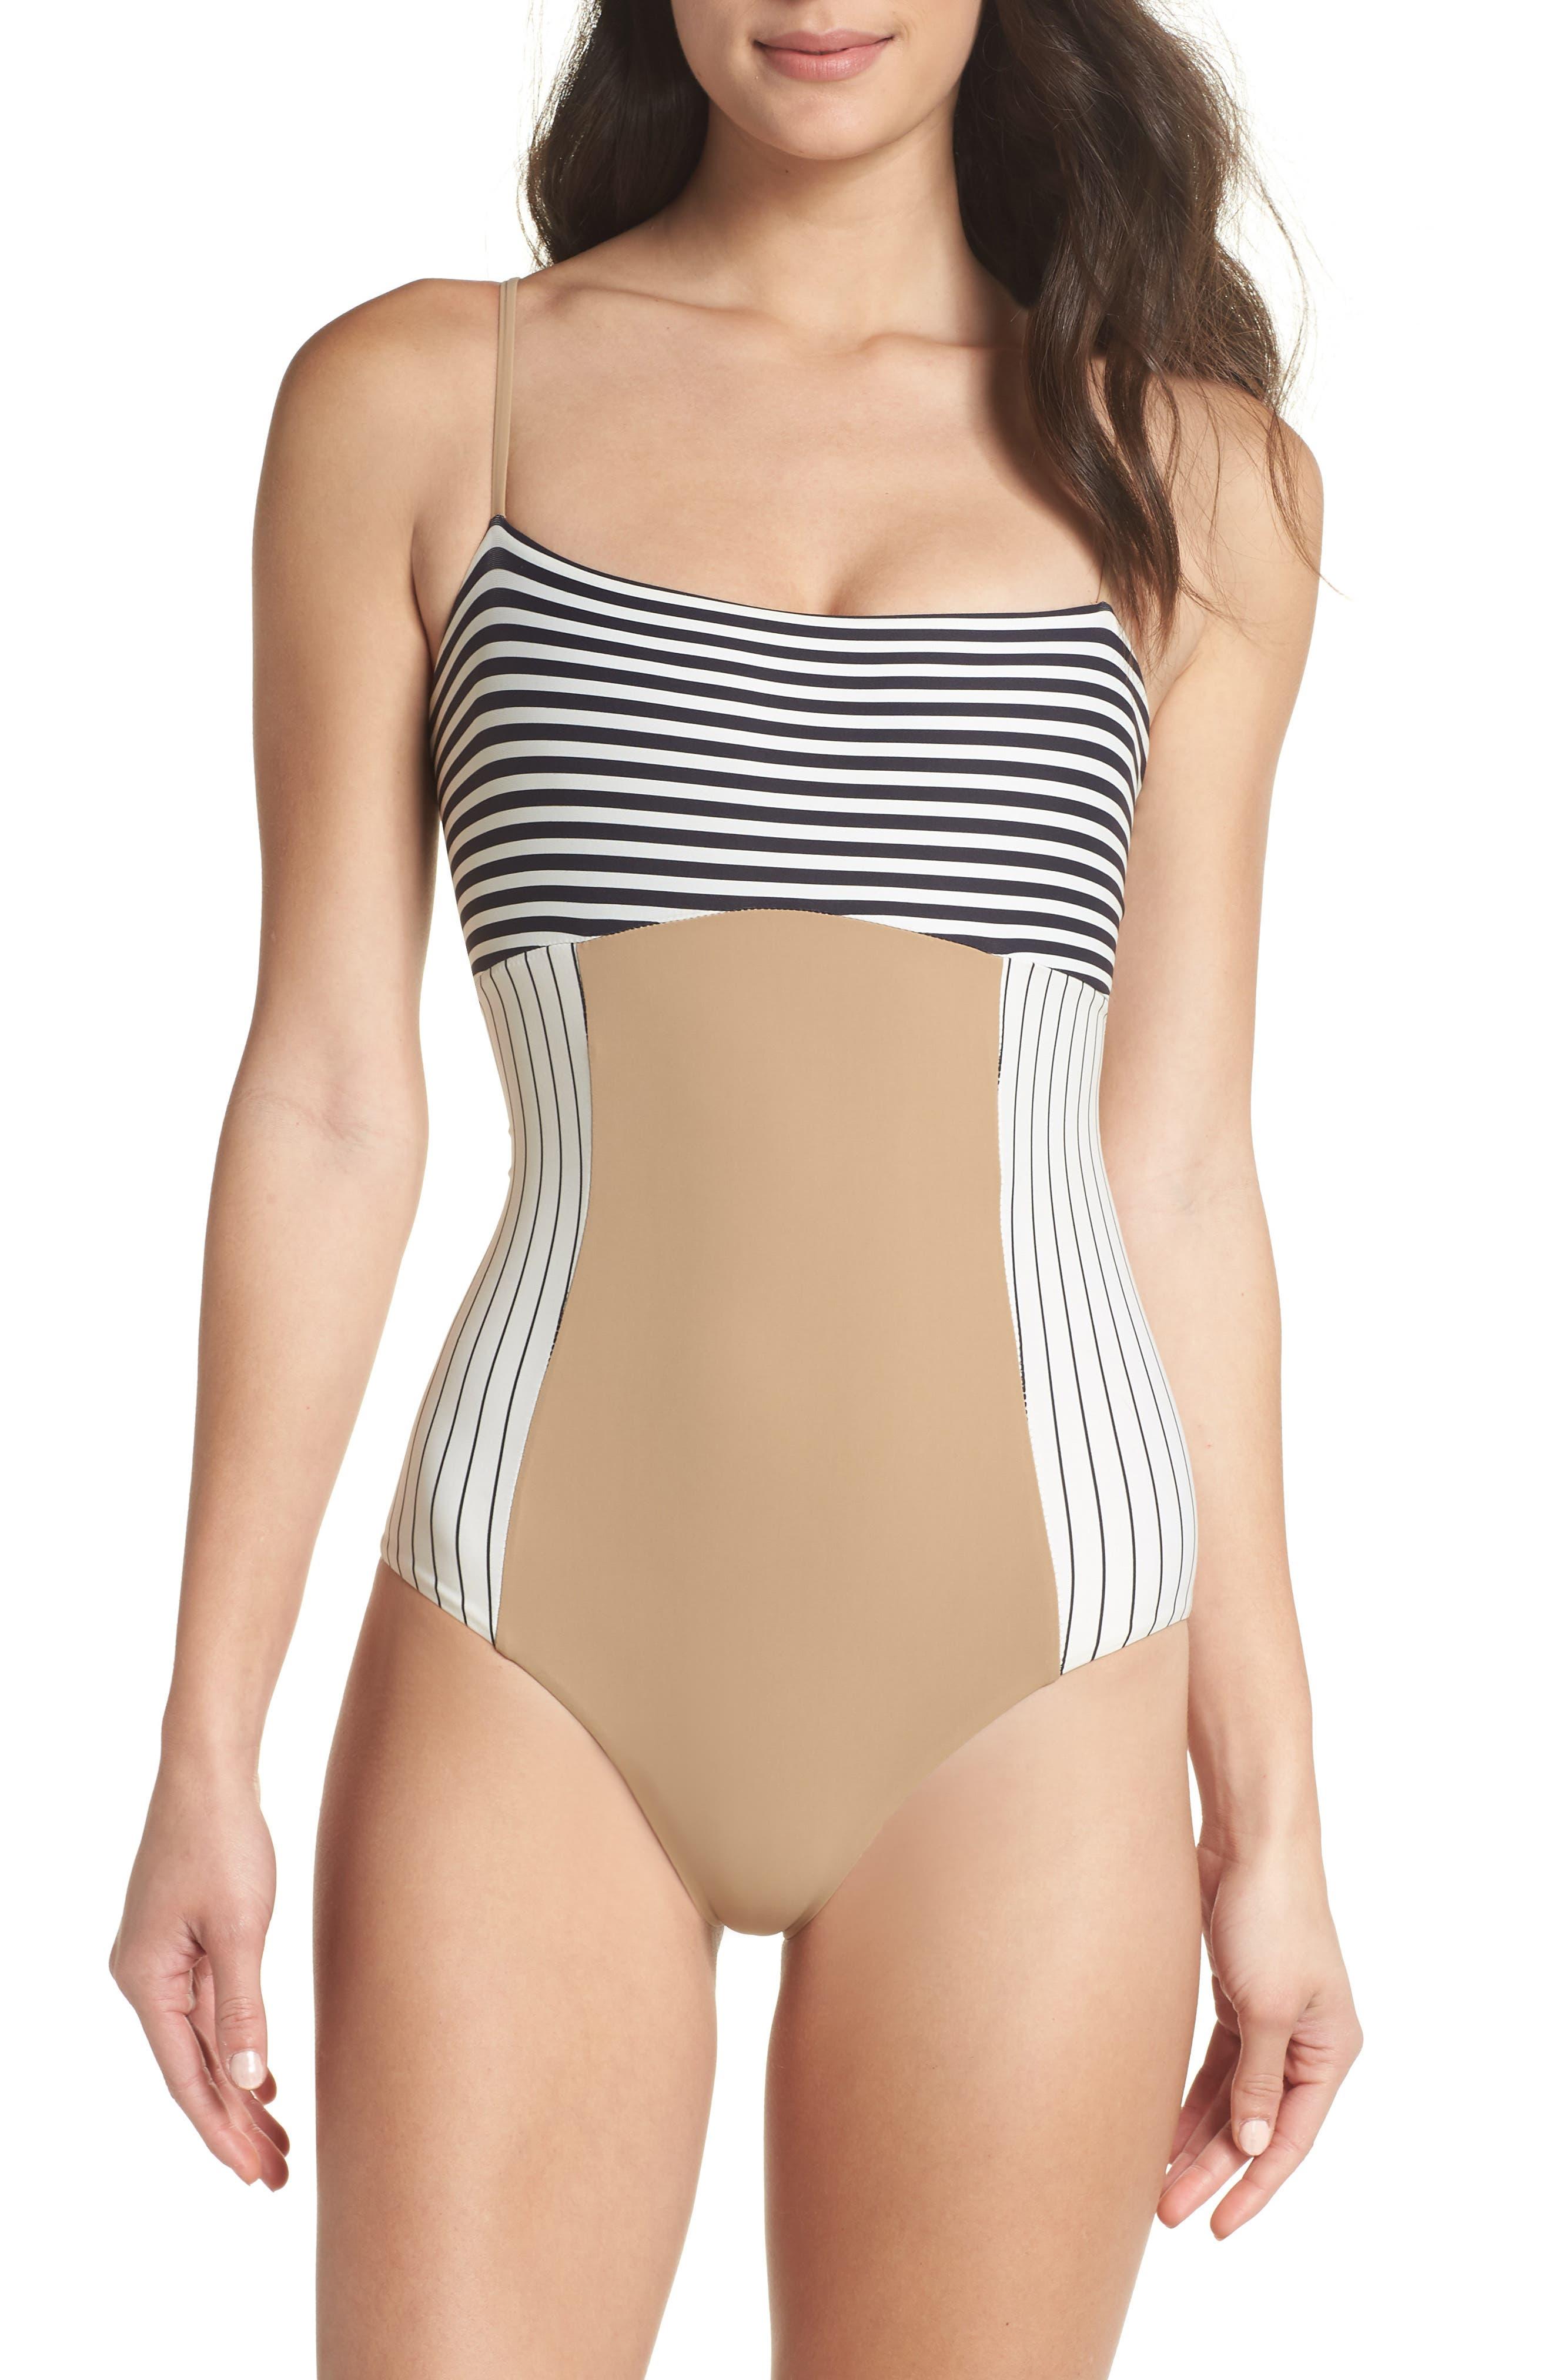 Finn One-Piece Swimsuit,                         Main,                         color,